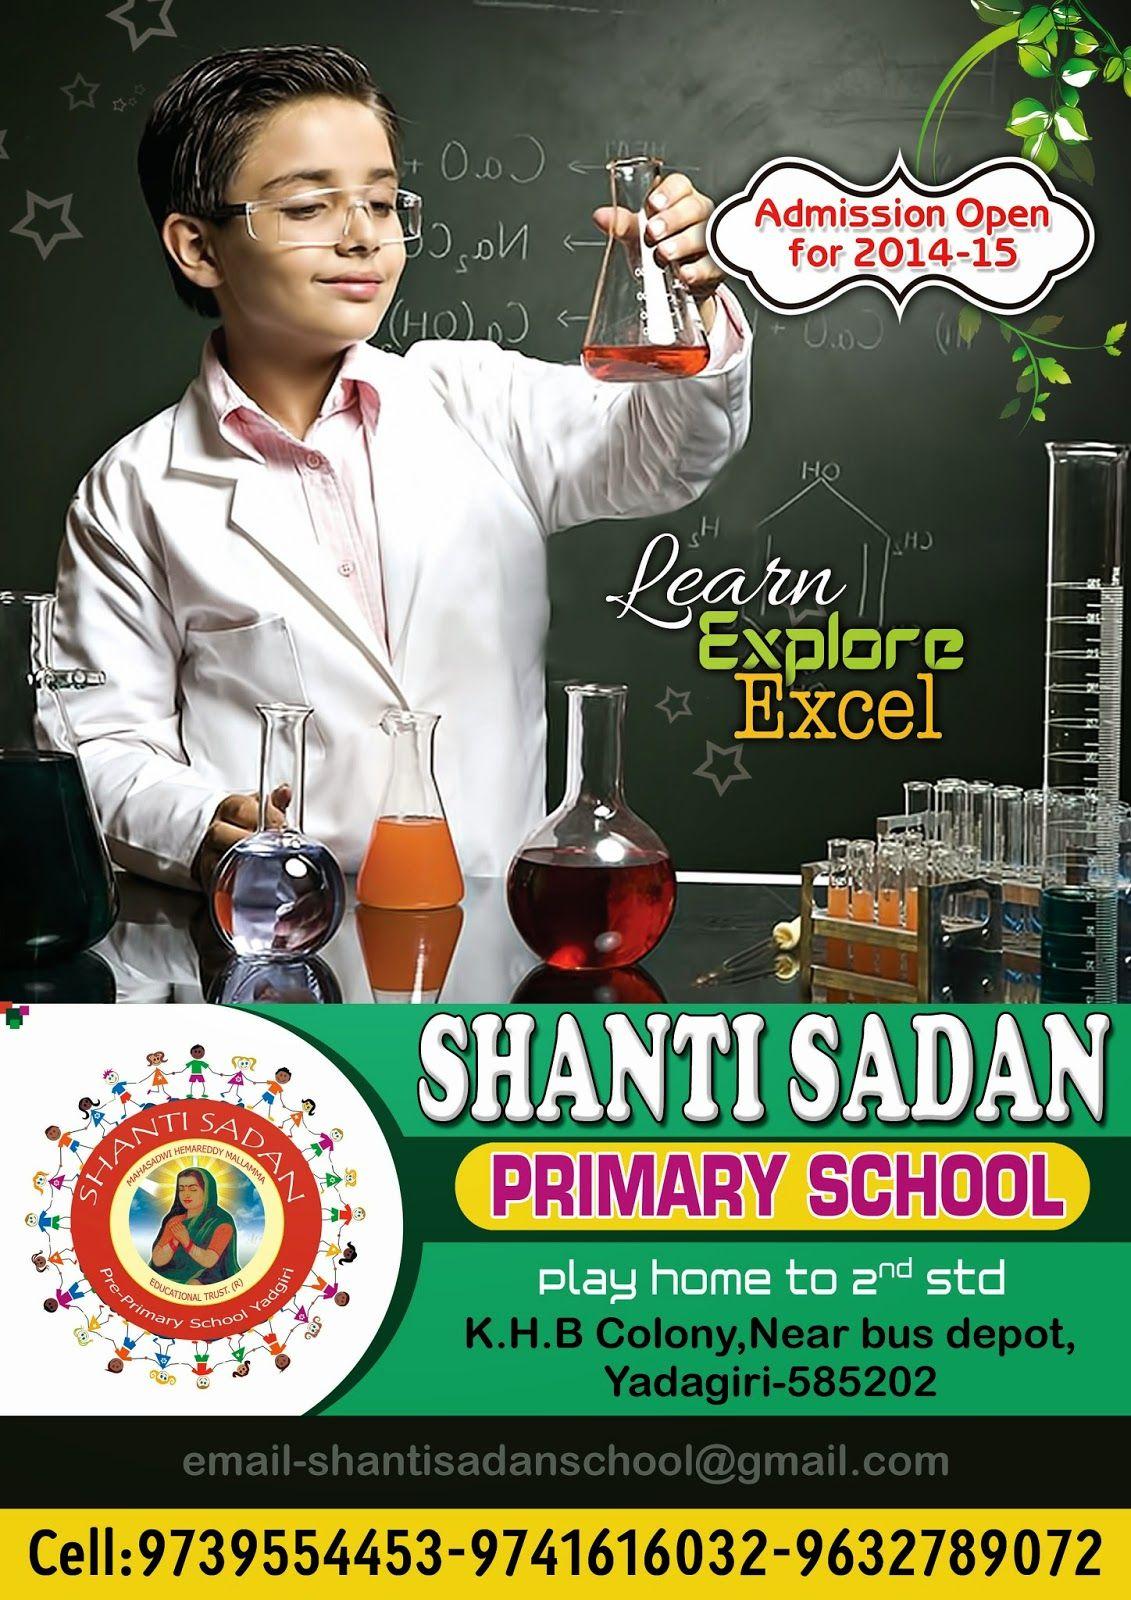 naveengfx com shanti sadan karnataka brochure brochures shanti sadan karnataka brochure school flyer templates